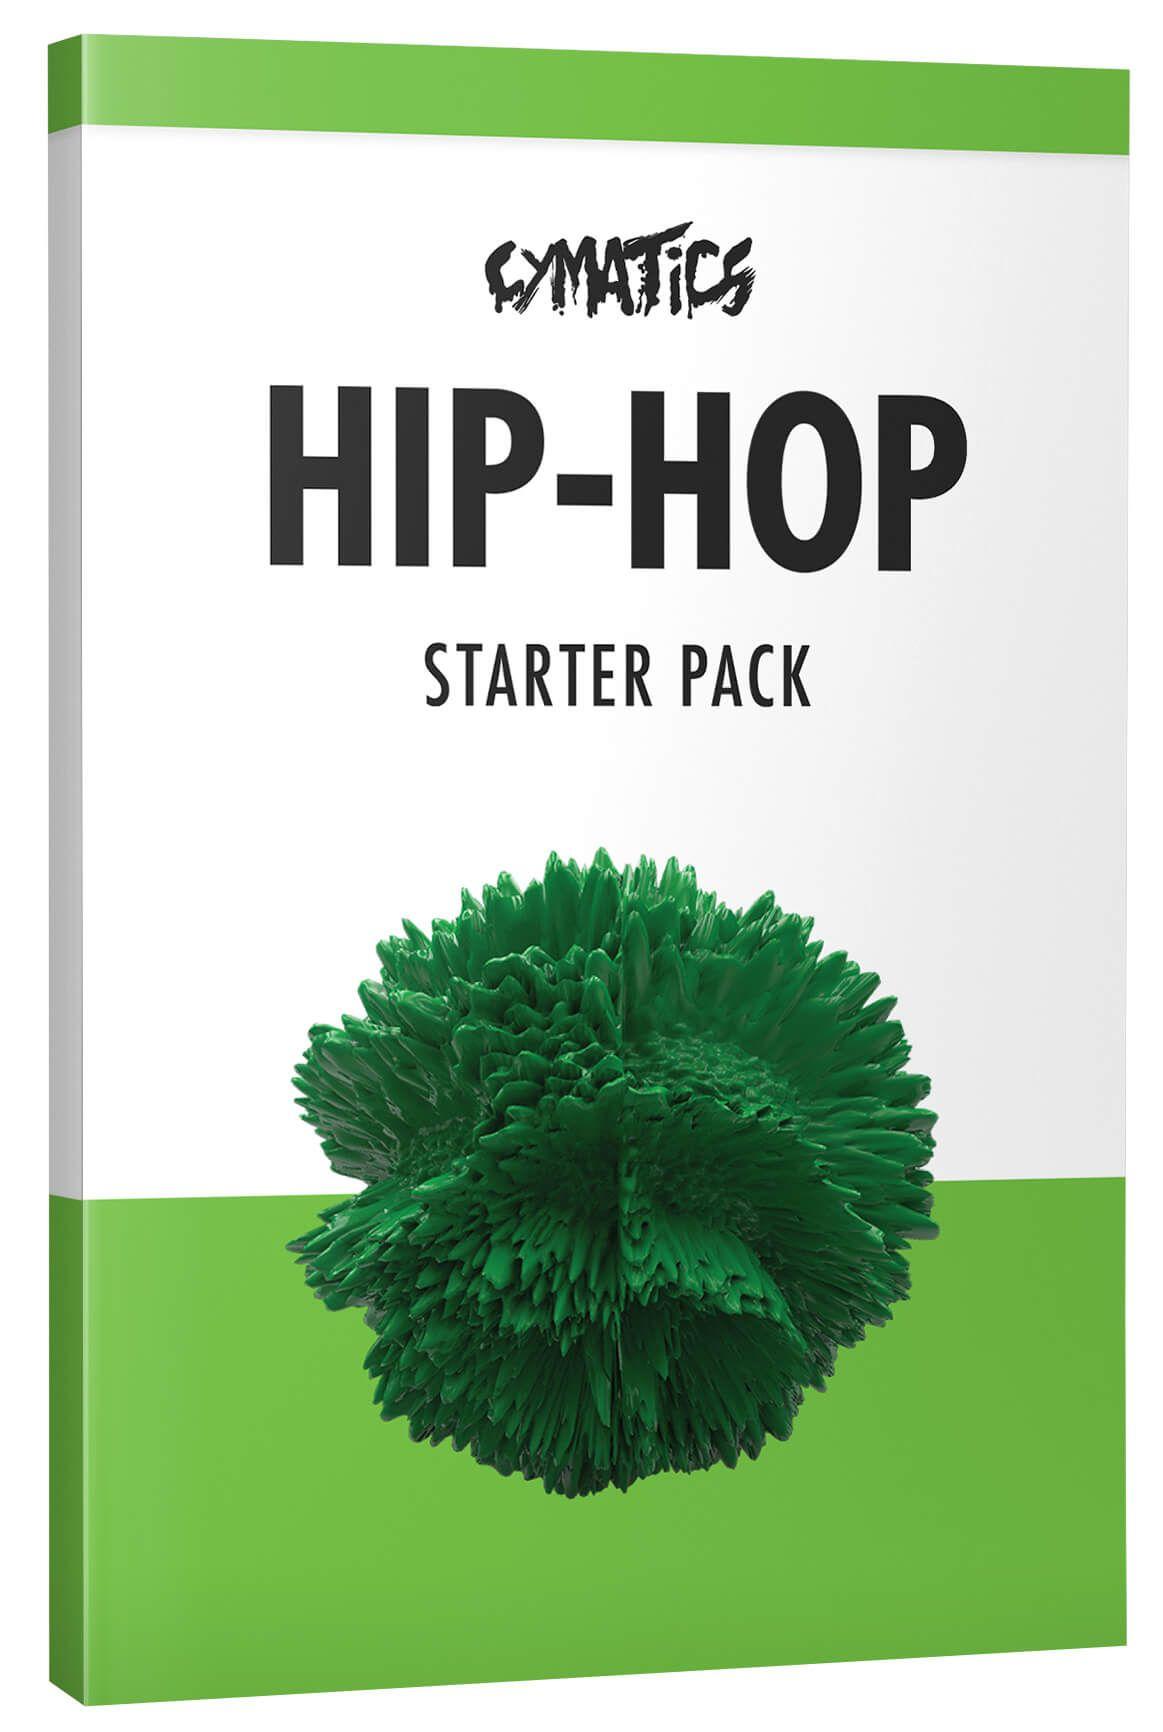 Free Downloads Vault Hip hop, Hip hop artists, Starters